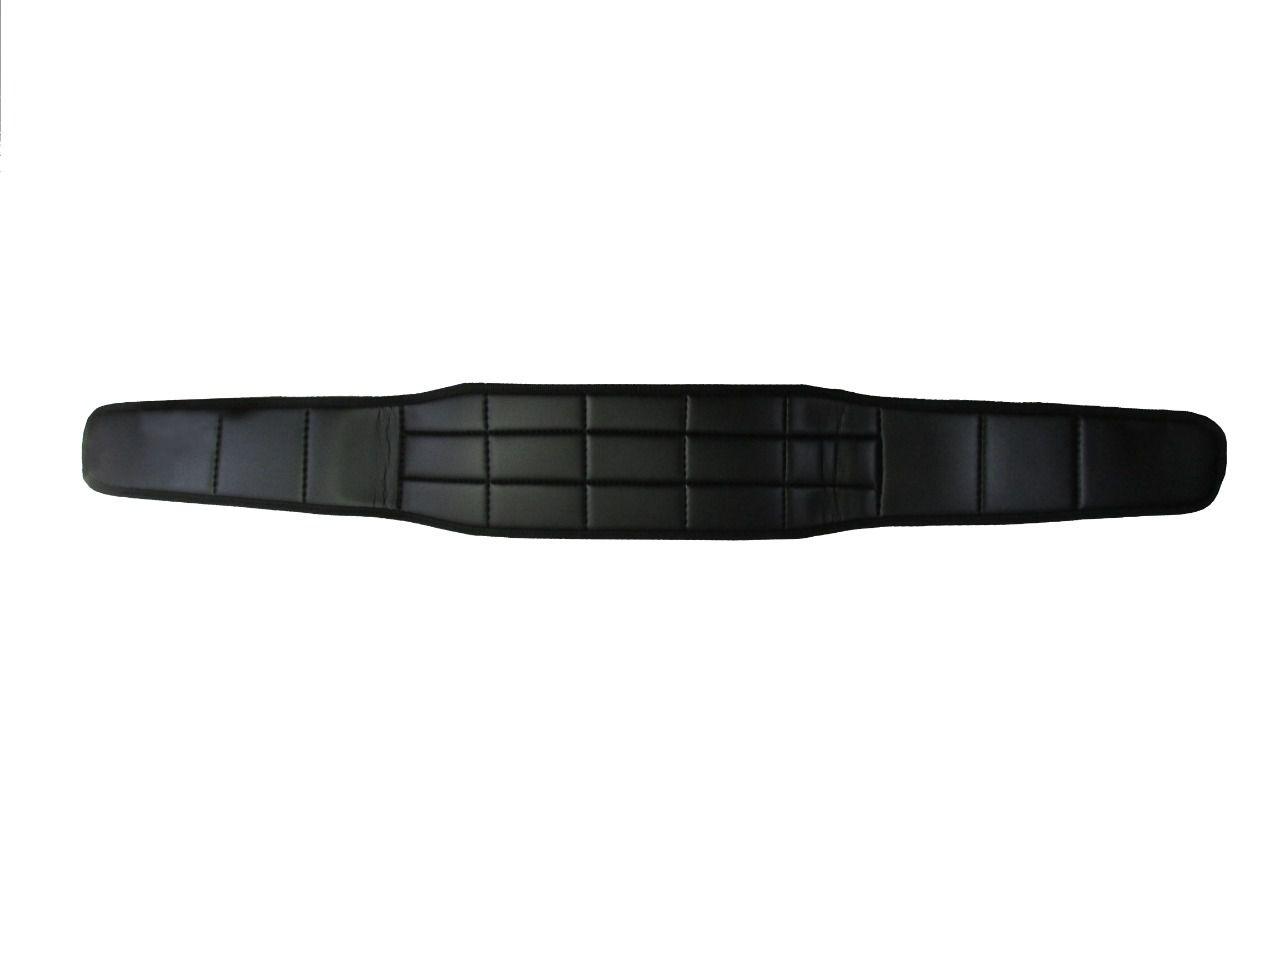 Cinturão Training GOHARDBR